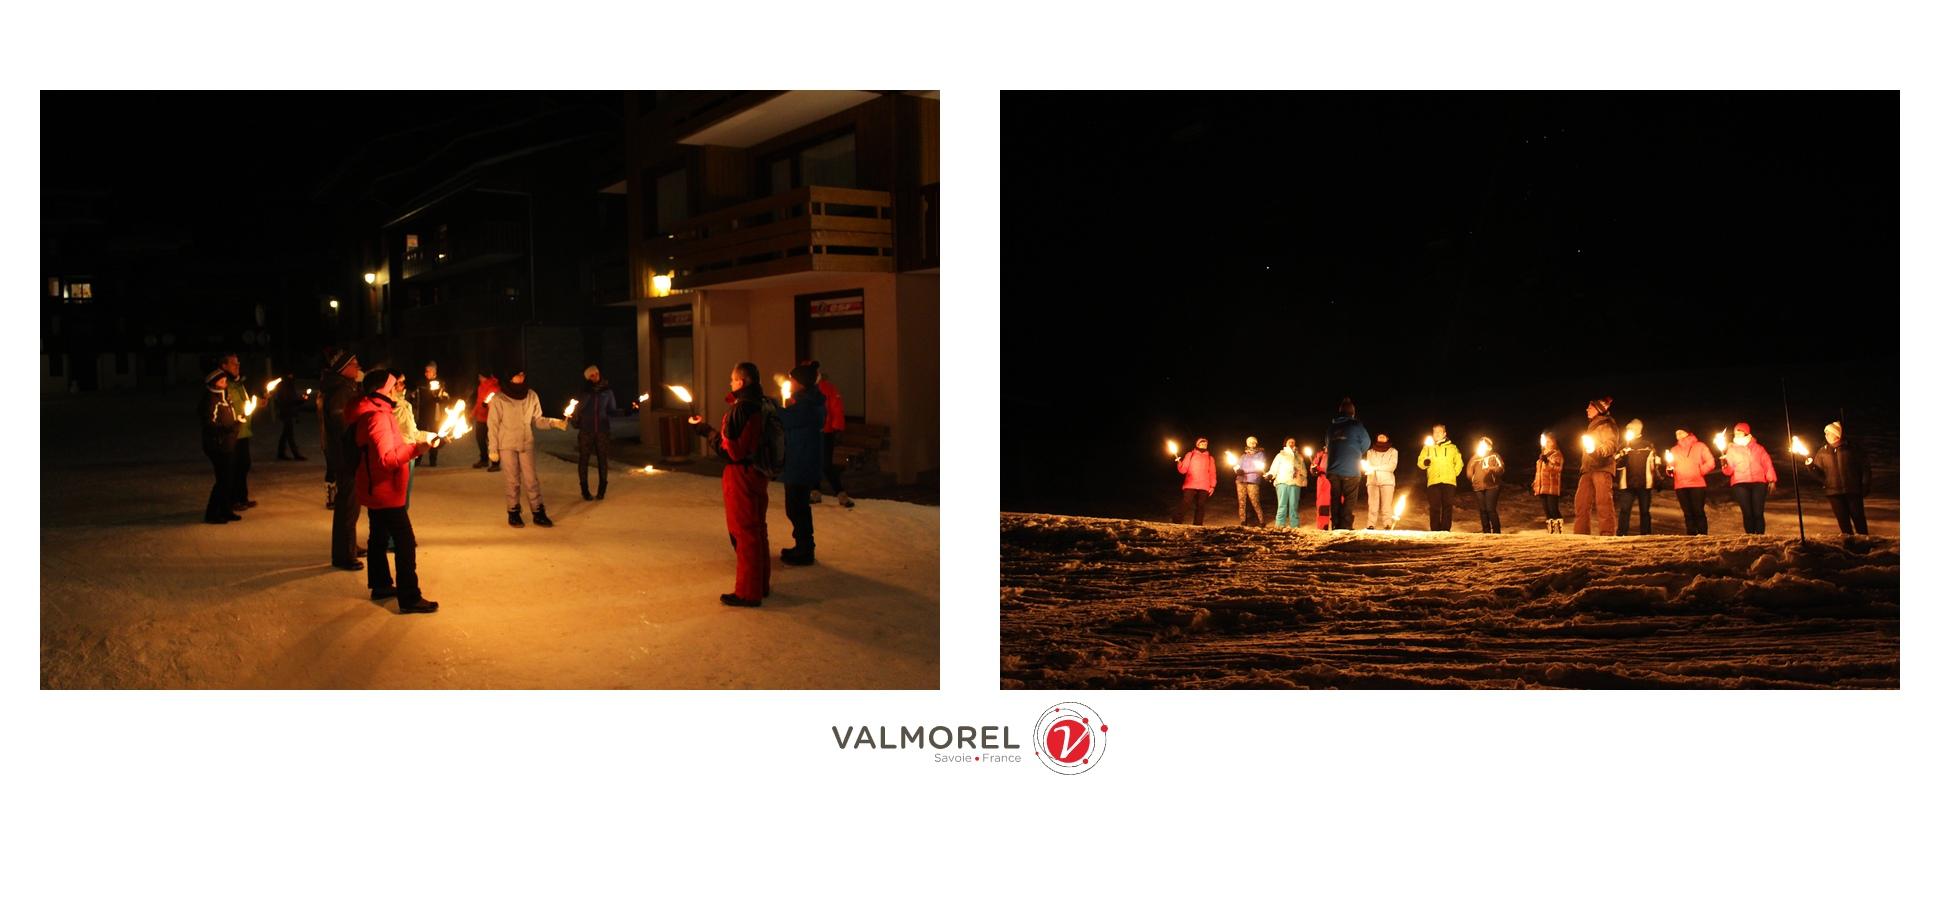 The gourmet torchlight walk - CGH Résidences